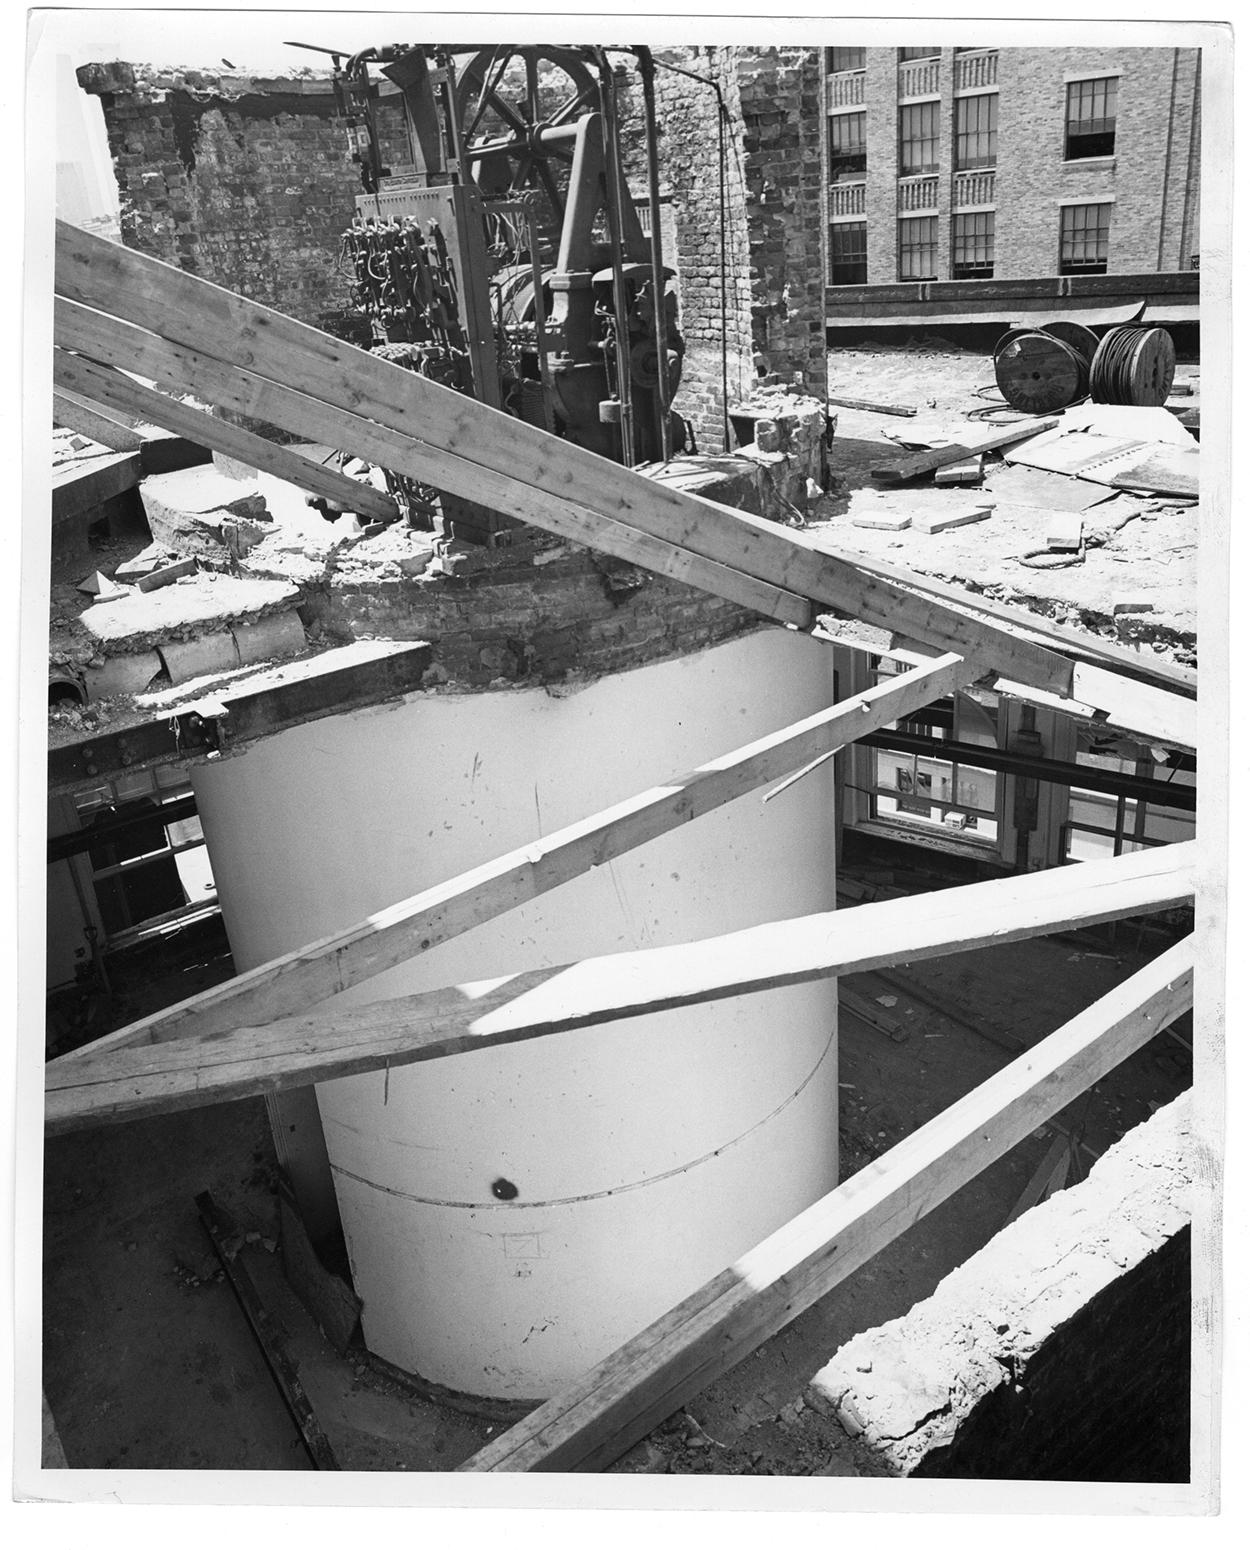 Foundation Building under renovation